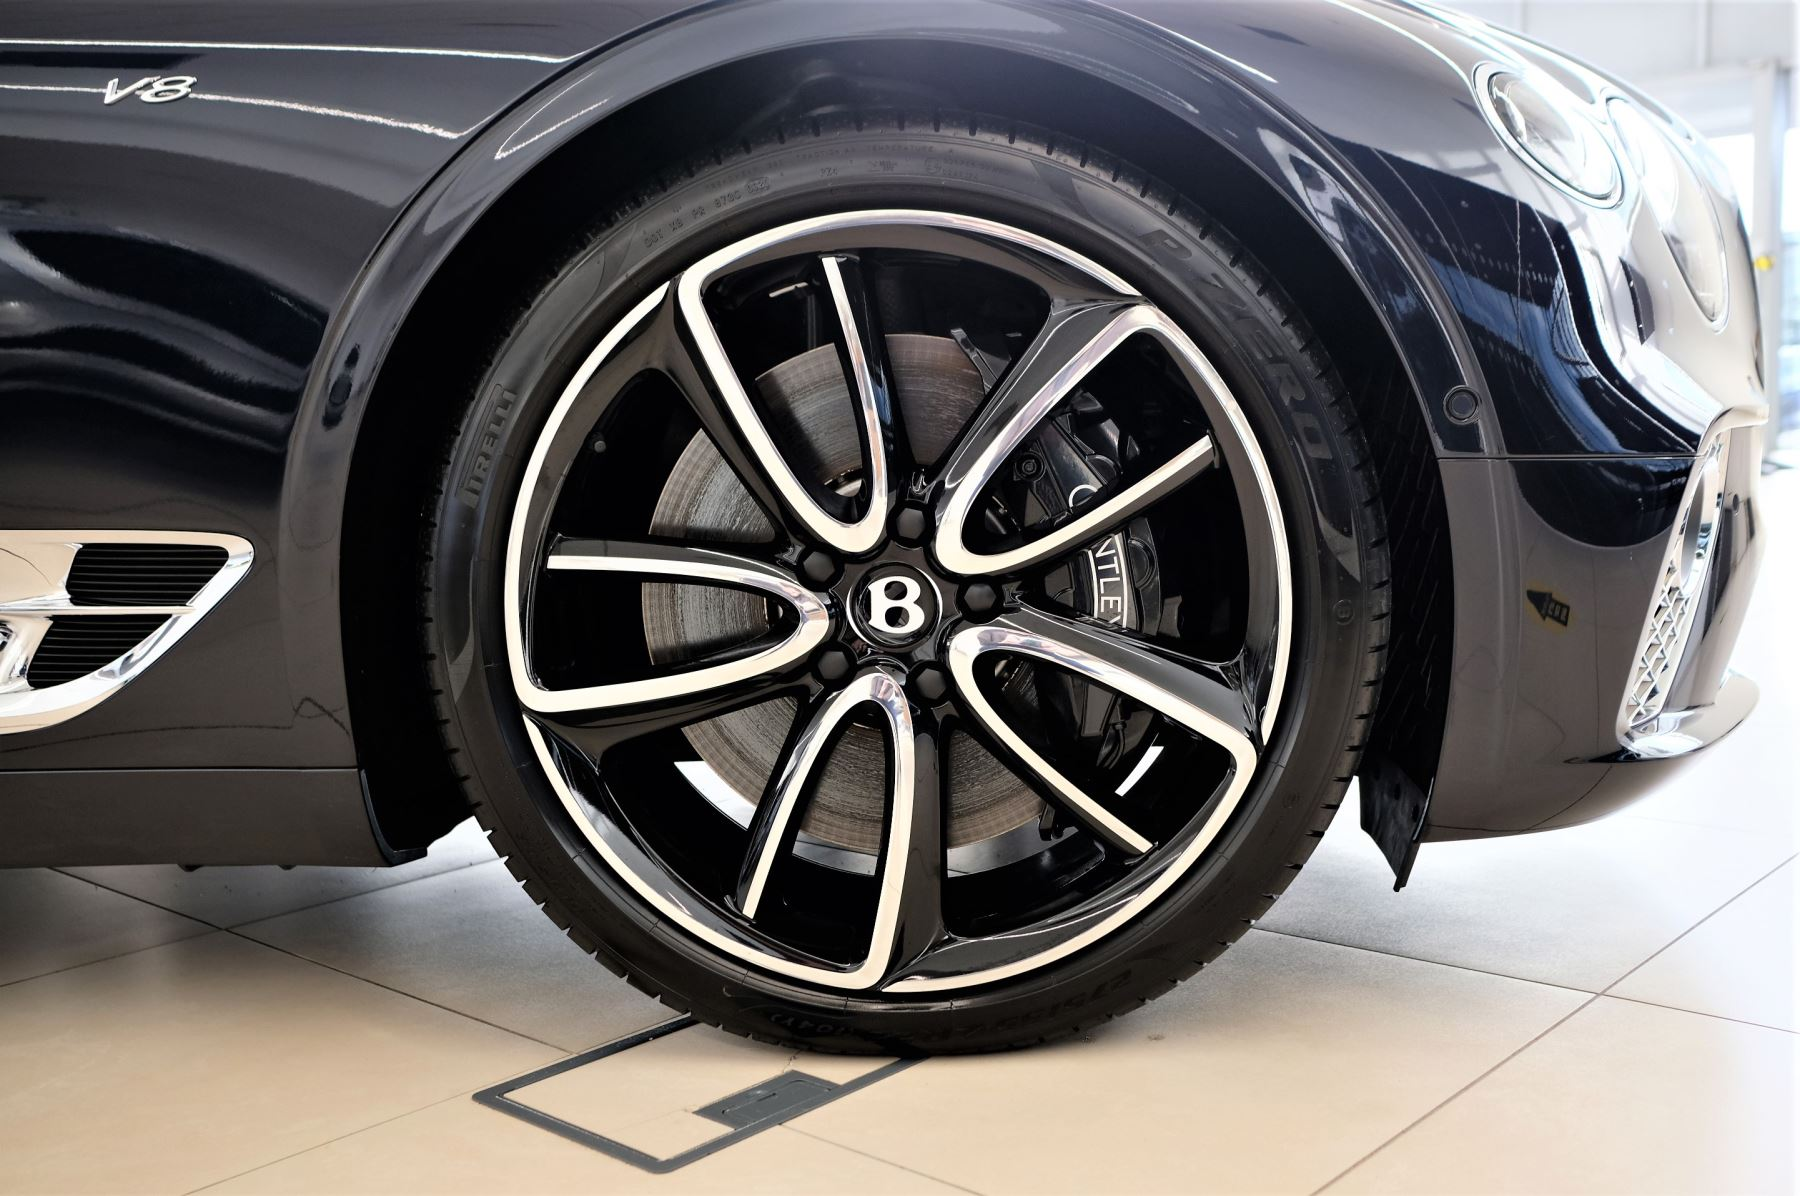 Bentley Continental GT 4.0 V8 Mulliner Edition Auto [Tour Spec] image 8